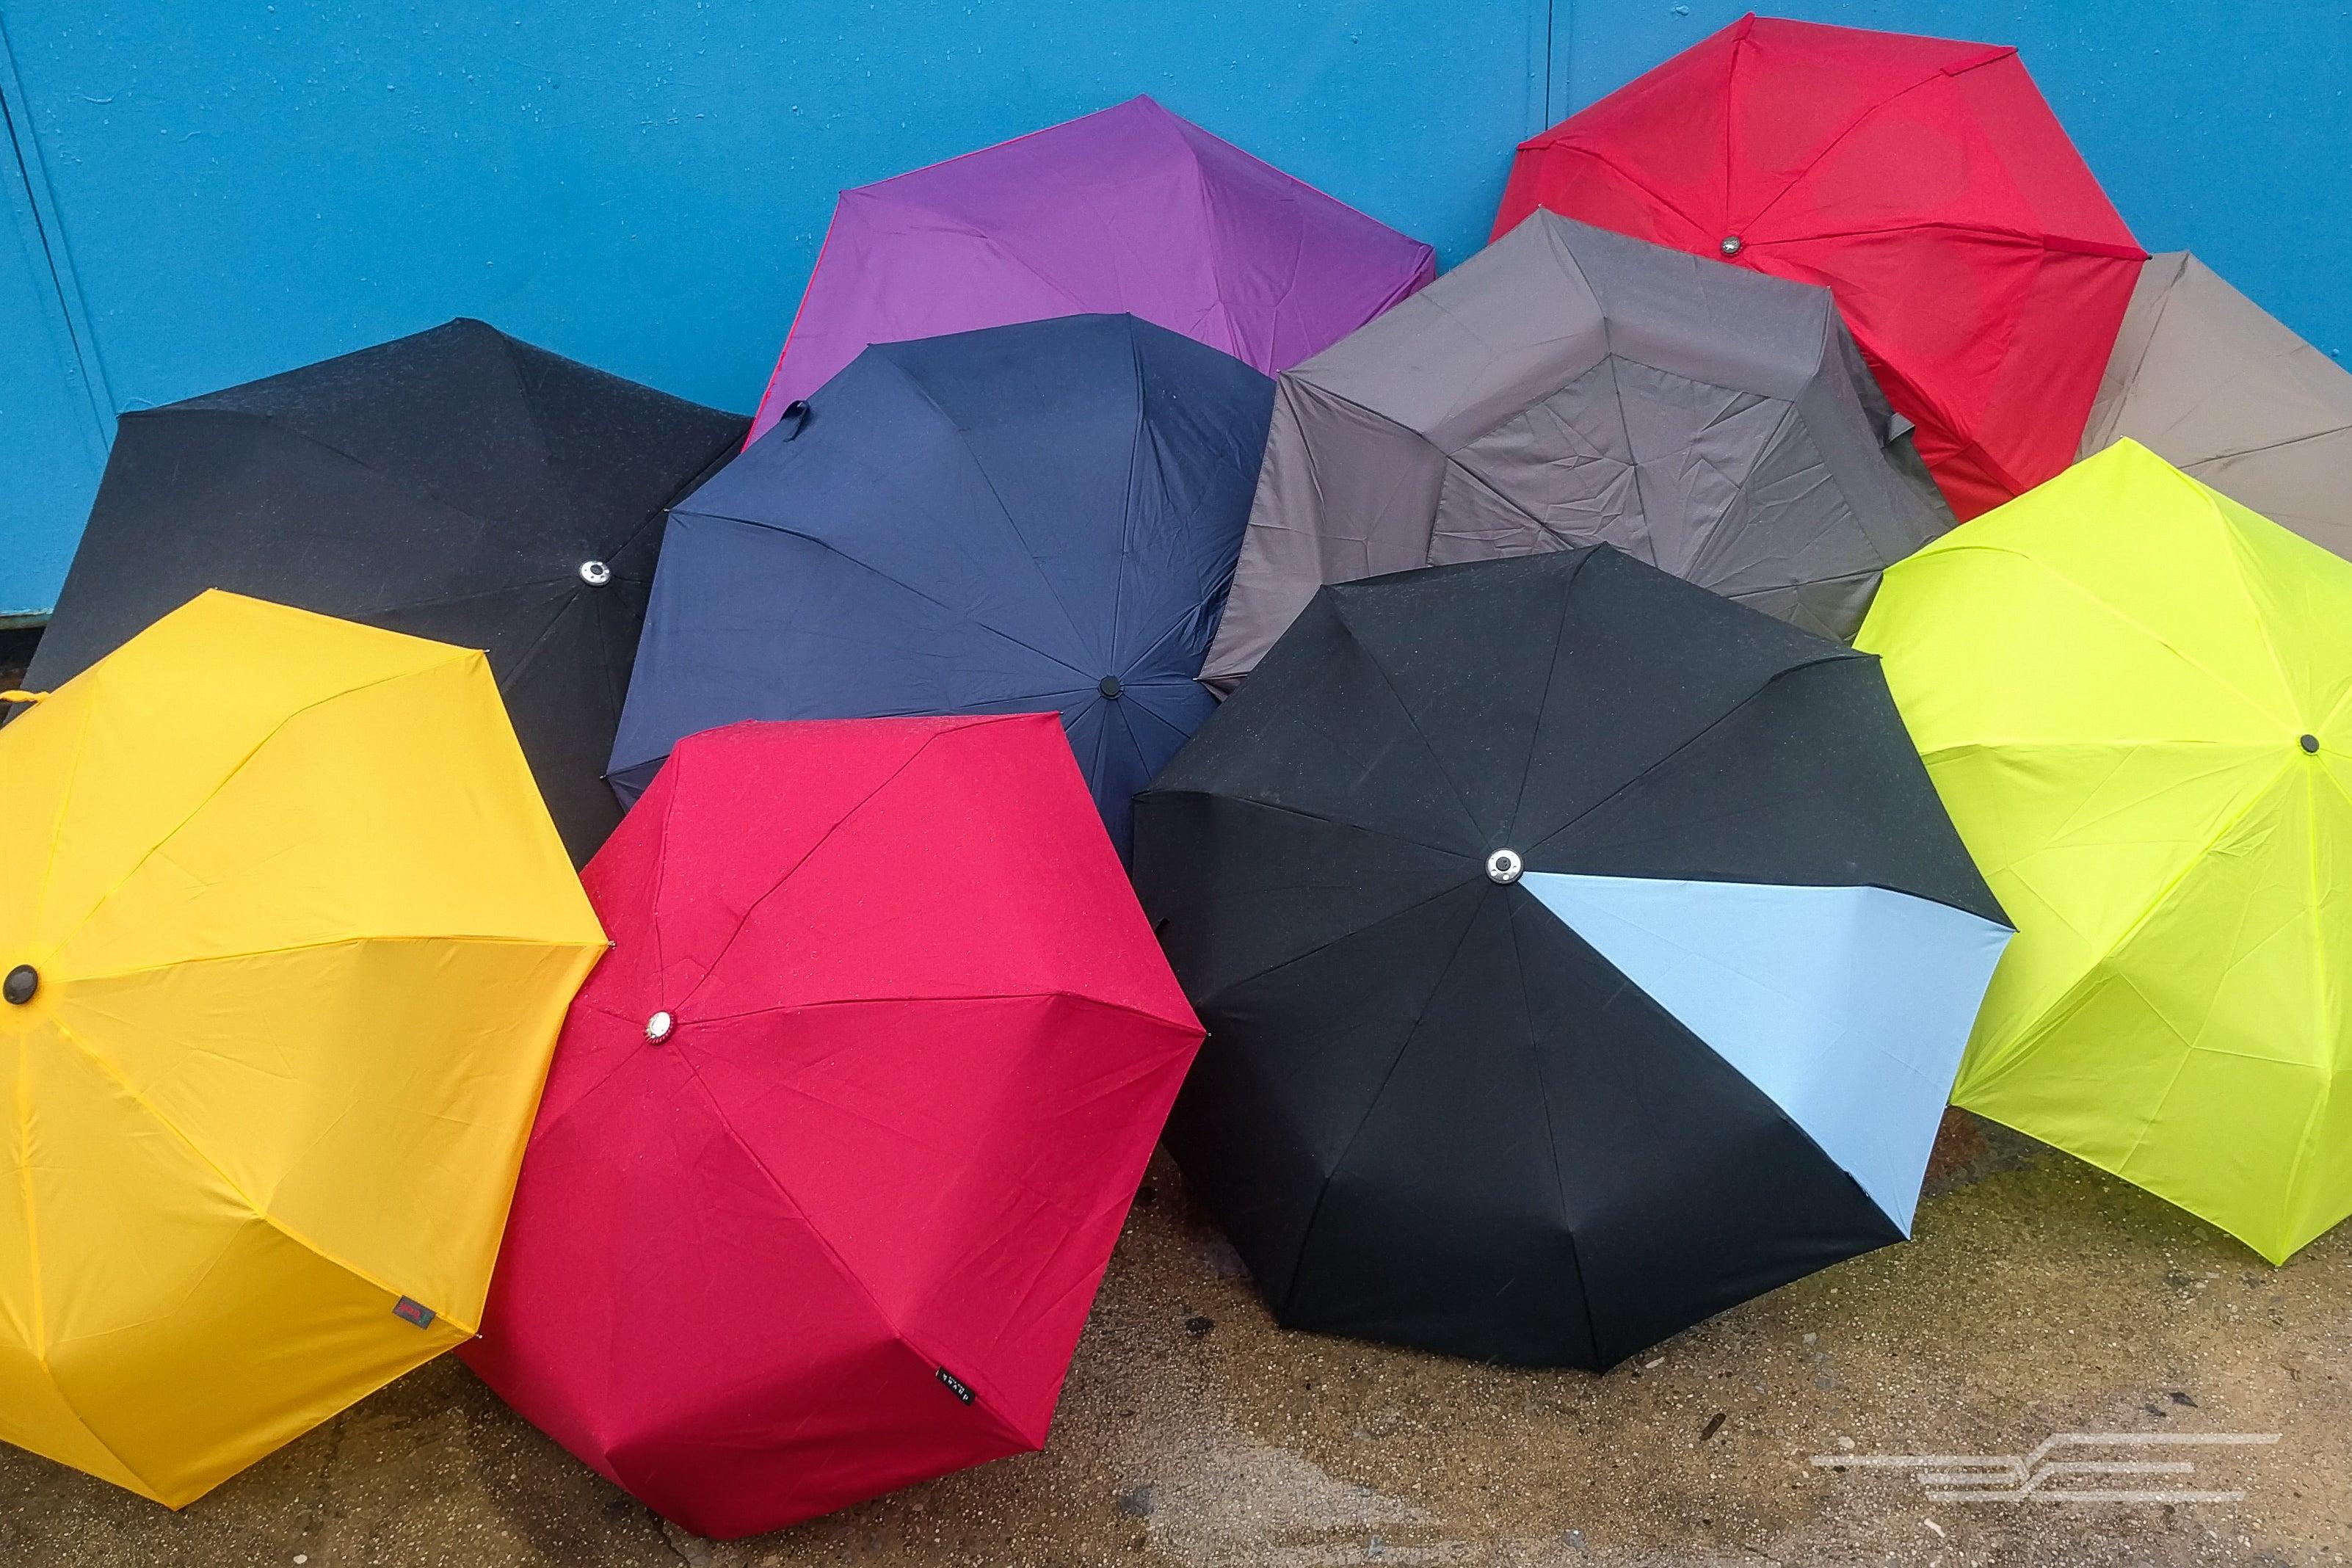 an assortment of opened umbrellas